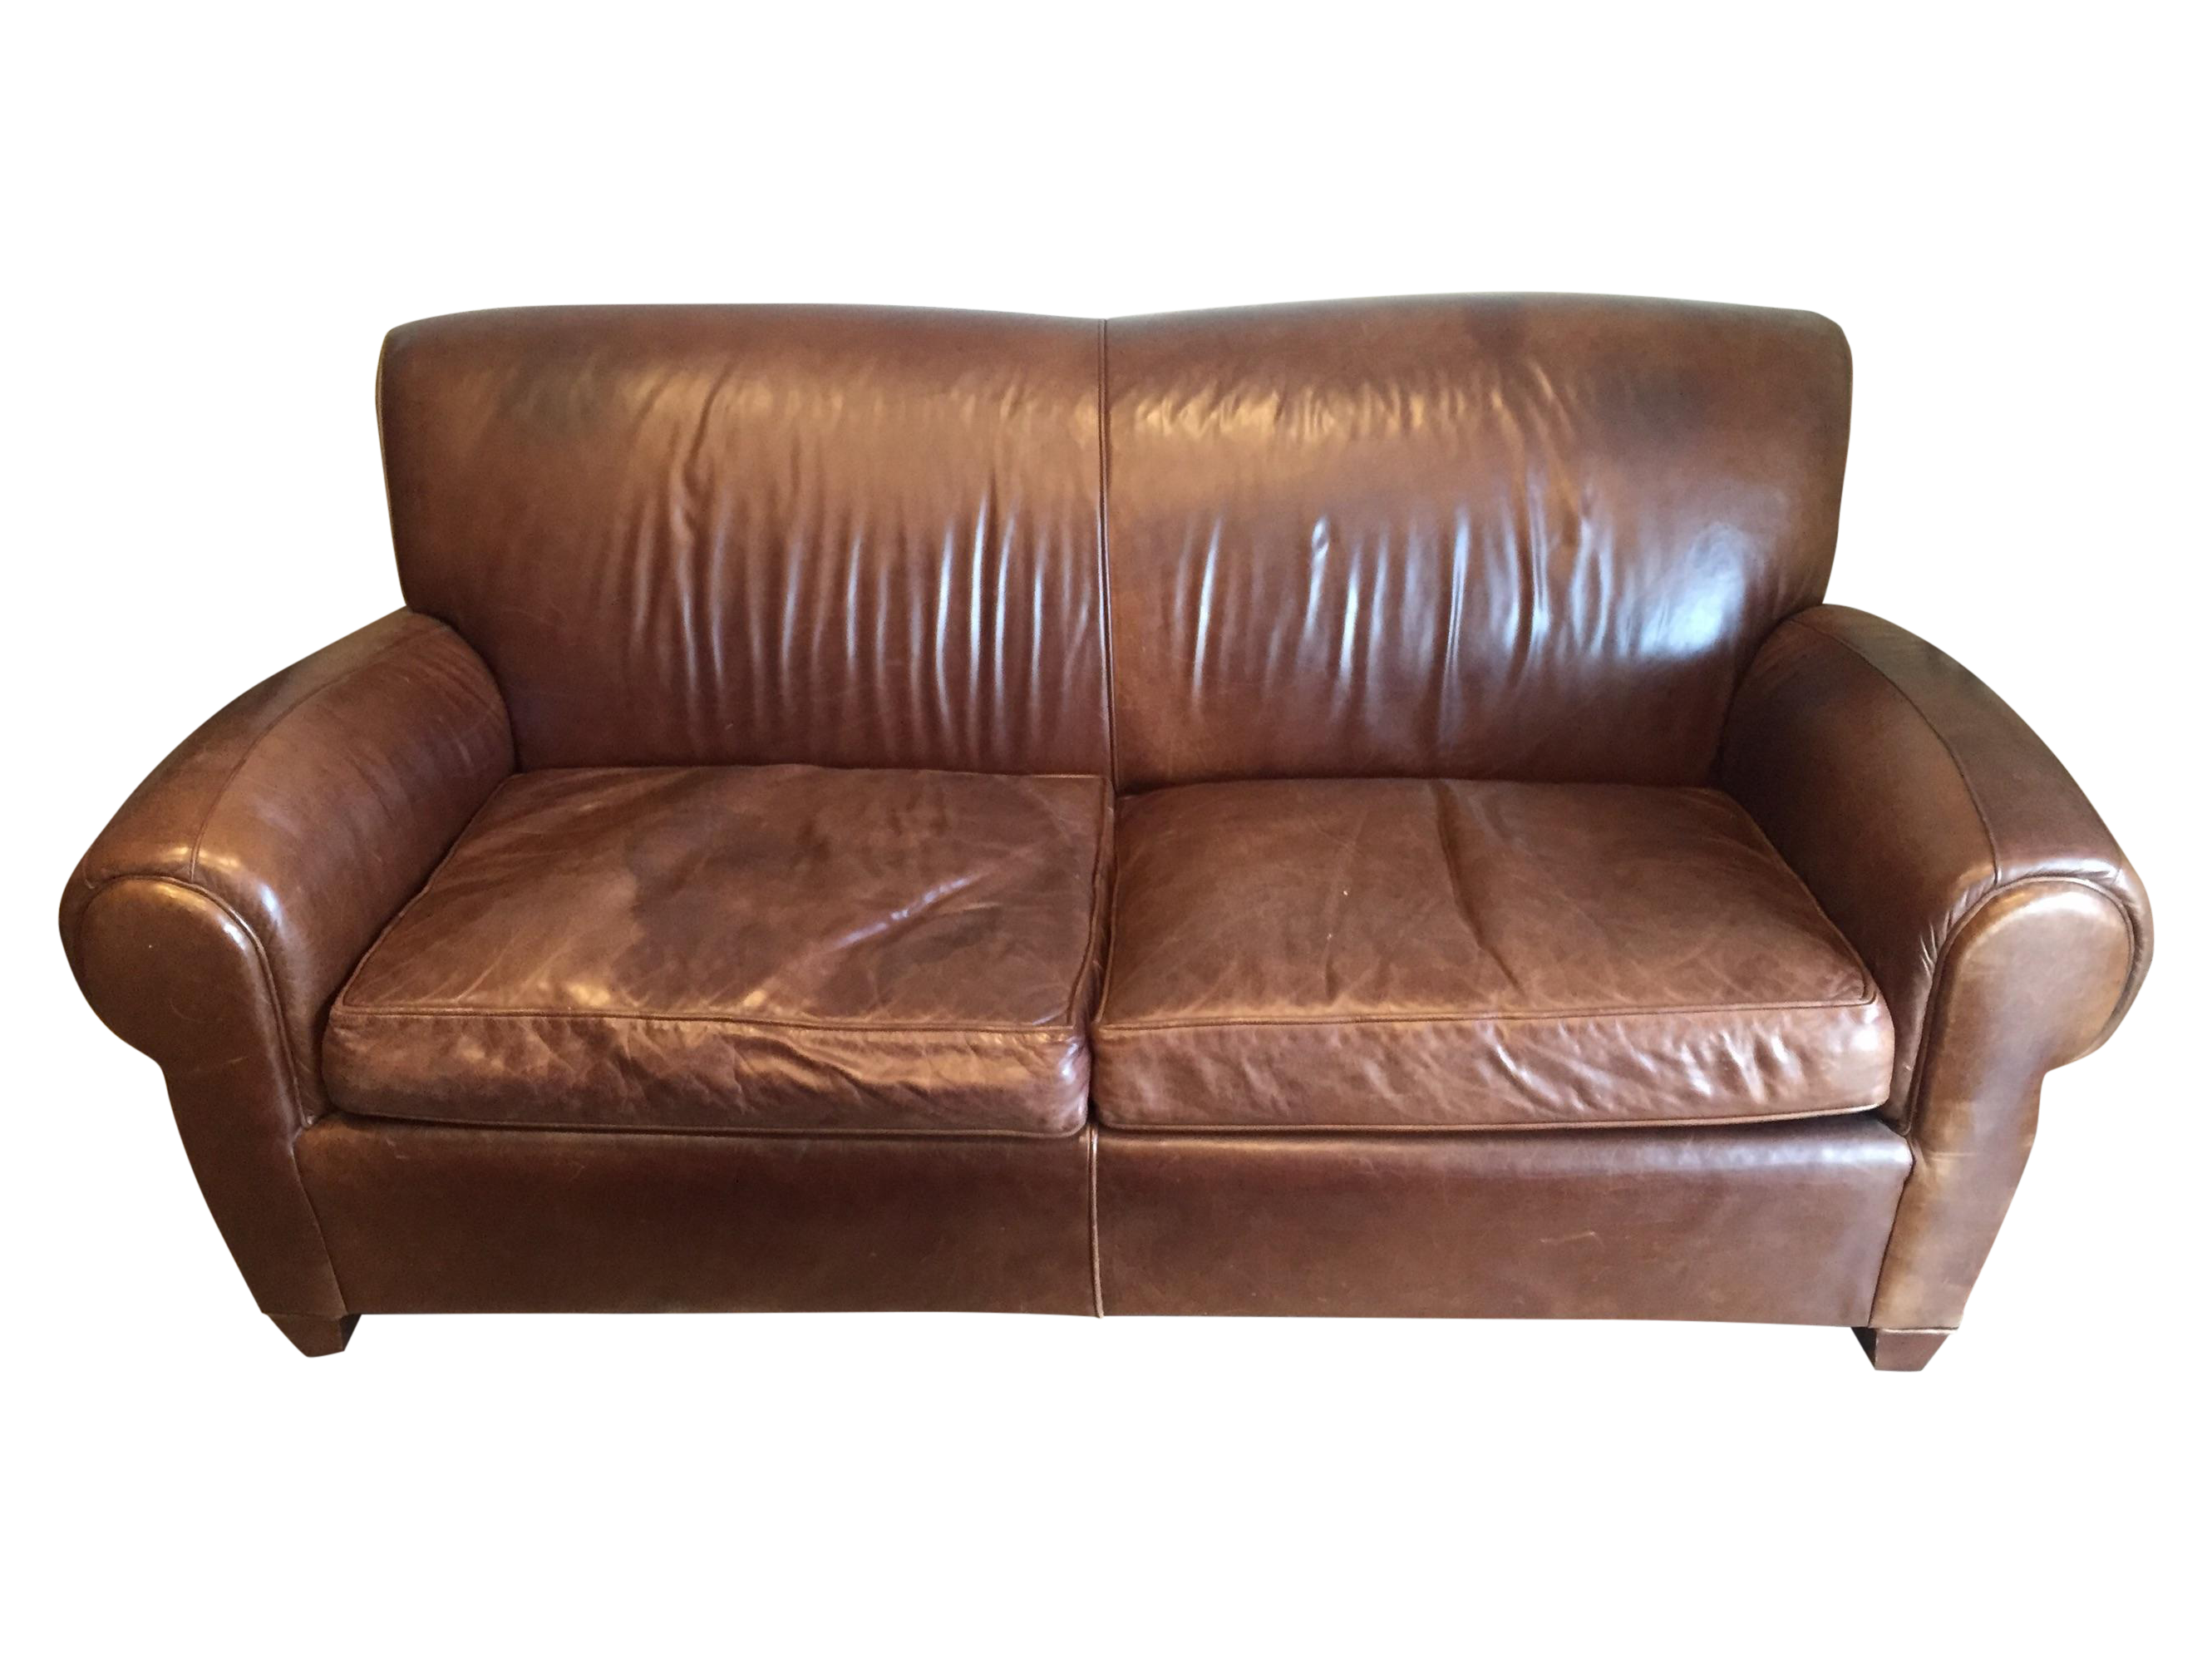 Manhattan Leather Sofa Pottery Barn Manhattan Leather Love Seat Sofa Chairish TheSofa